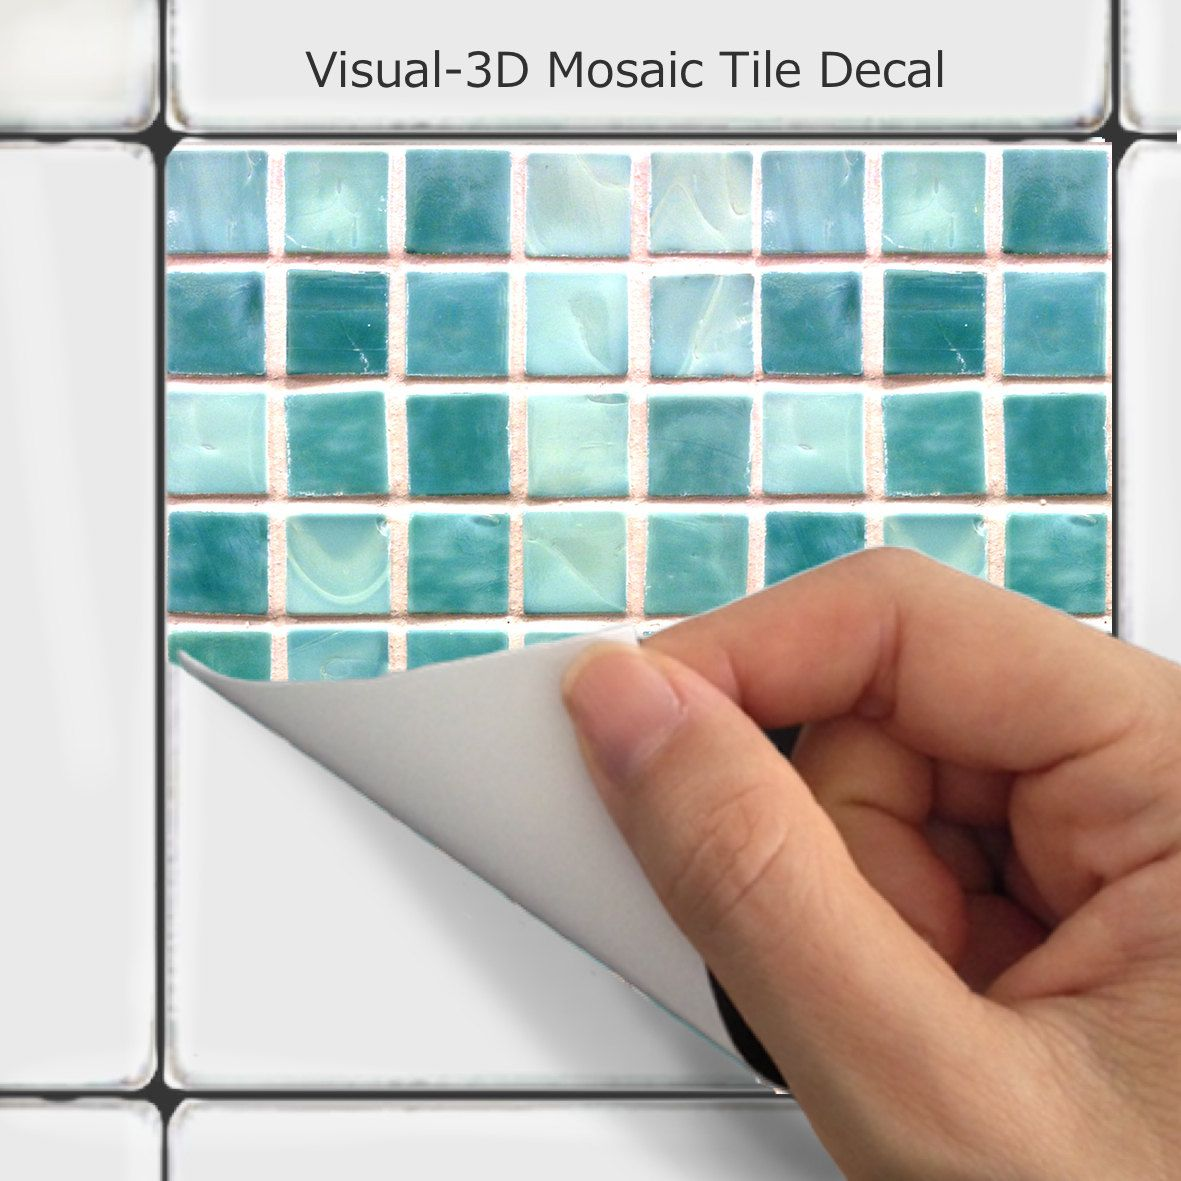 Kitchen Tile Decals Stickers Wall Tile Decals Vinyl Sticker Waterproof Tile Or Wallpaper For